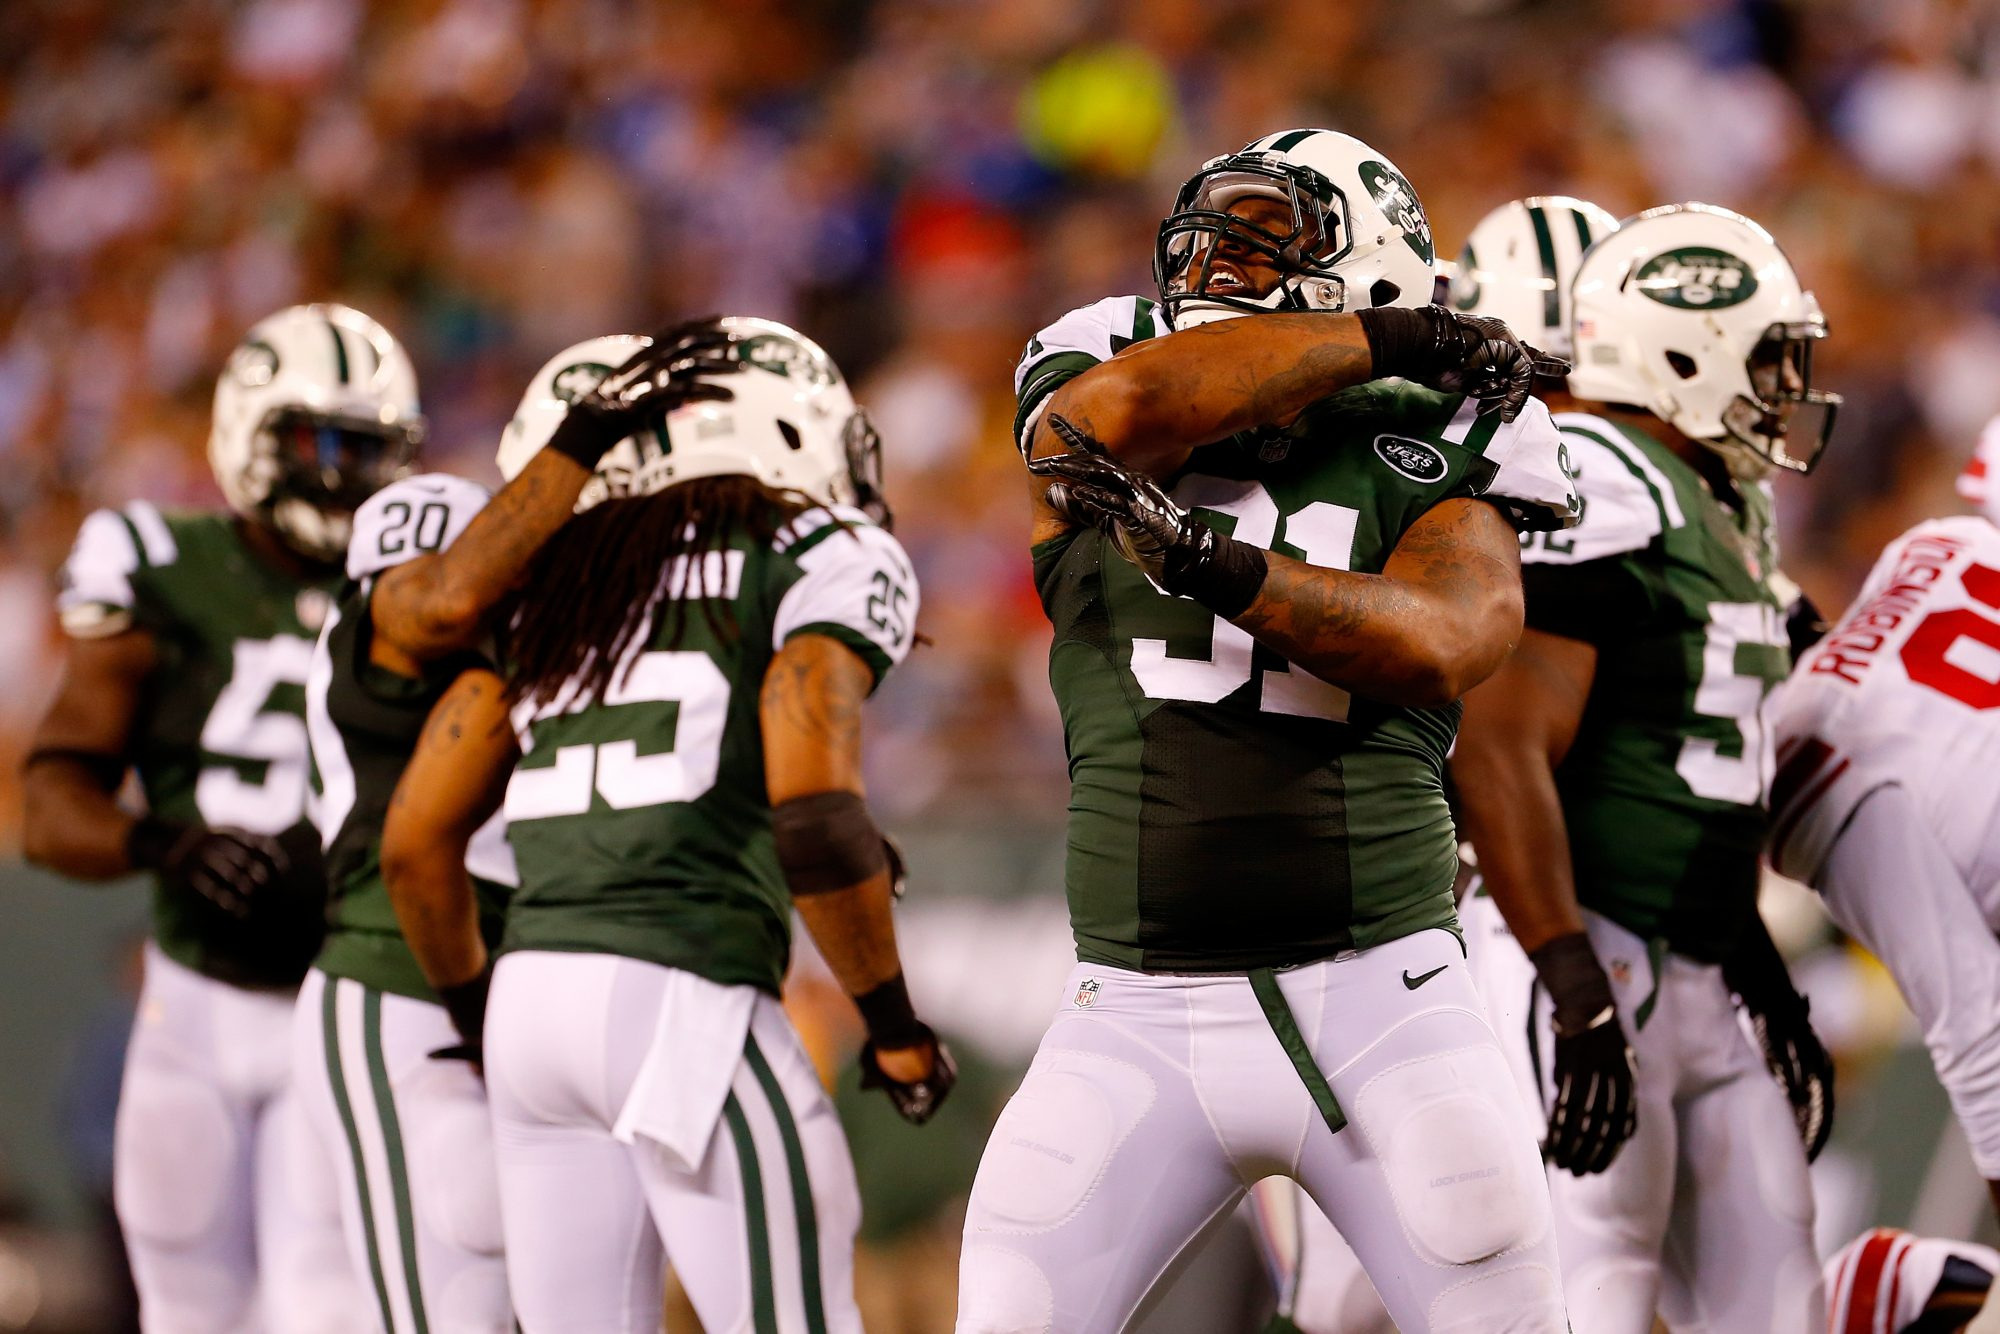 New York Jets: Sheldon Richardson vs. Brandon Marshall in the Snoopy Bowl 1